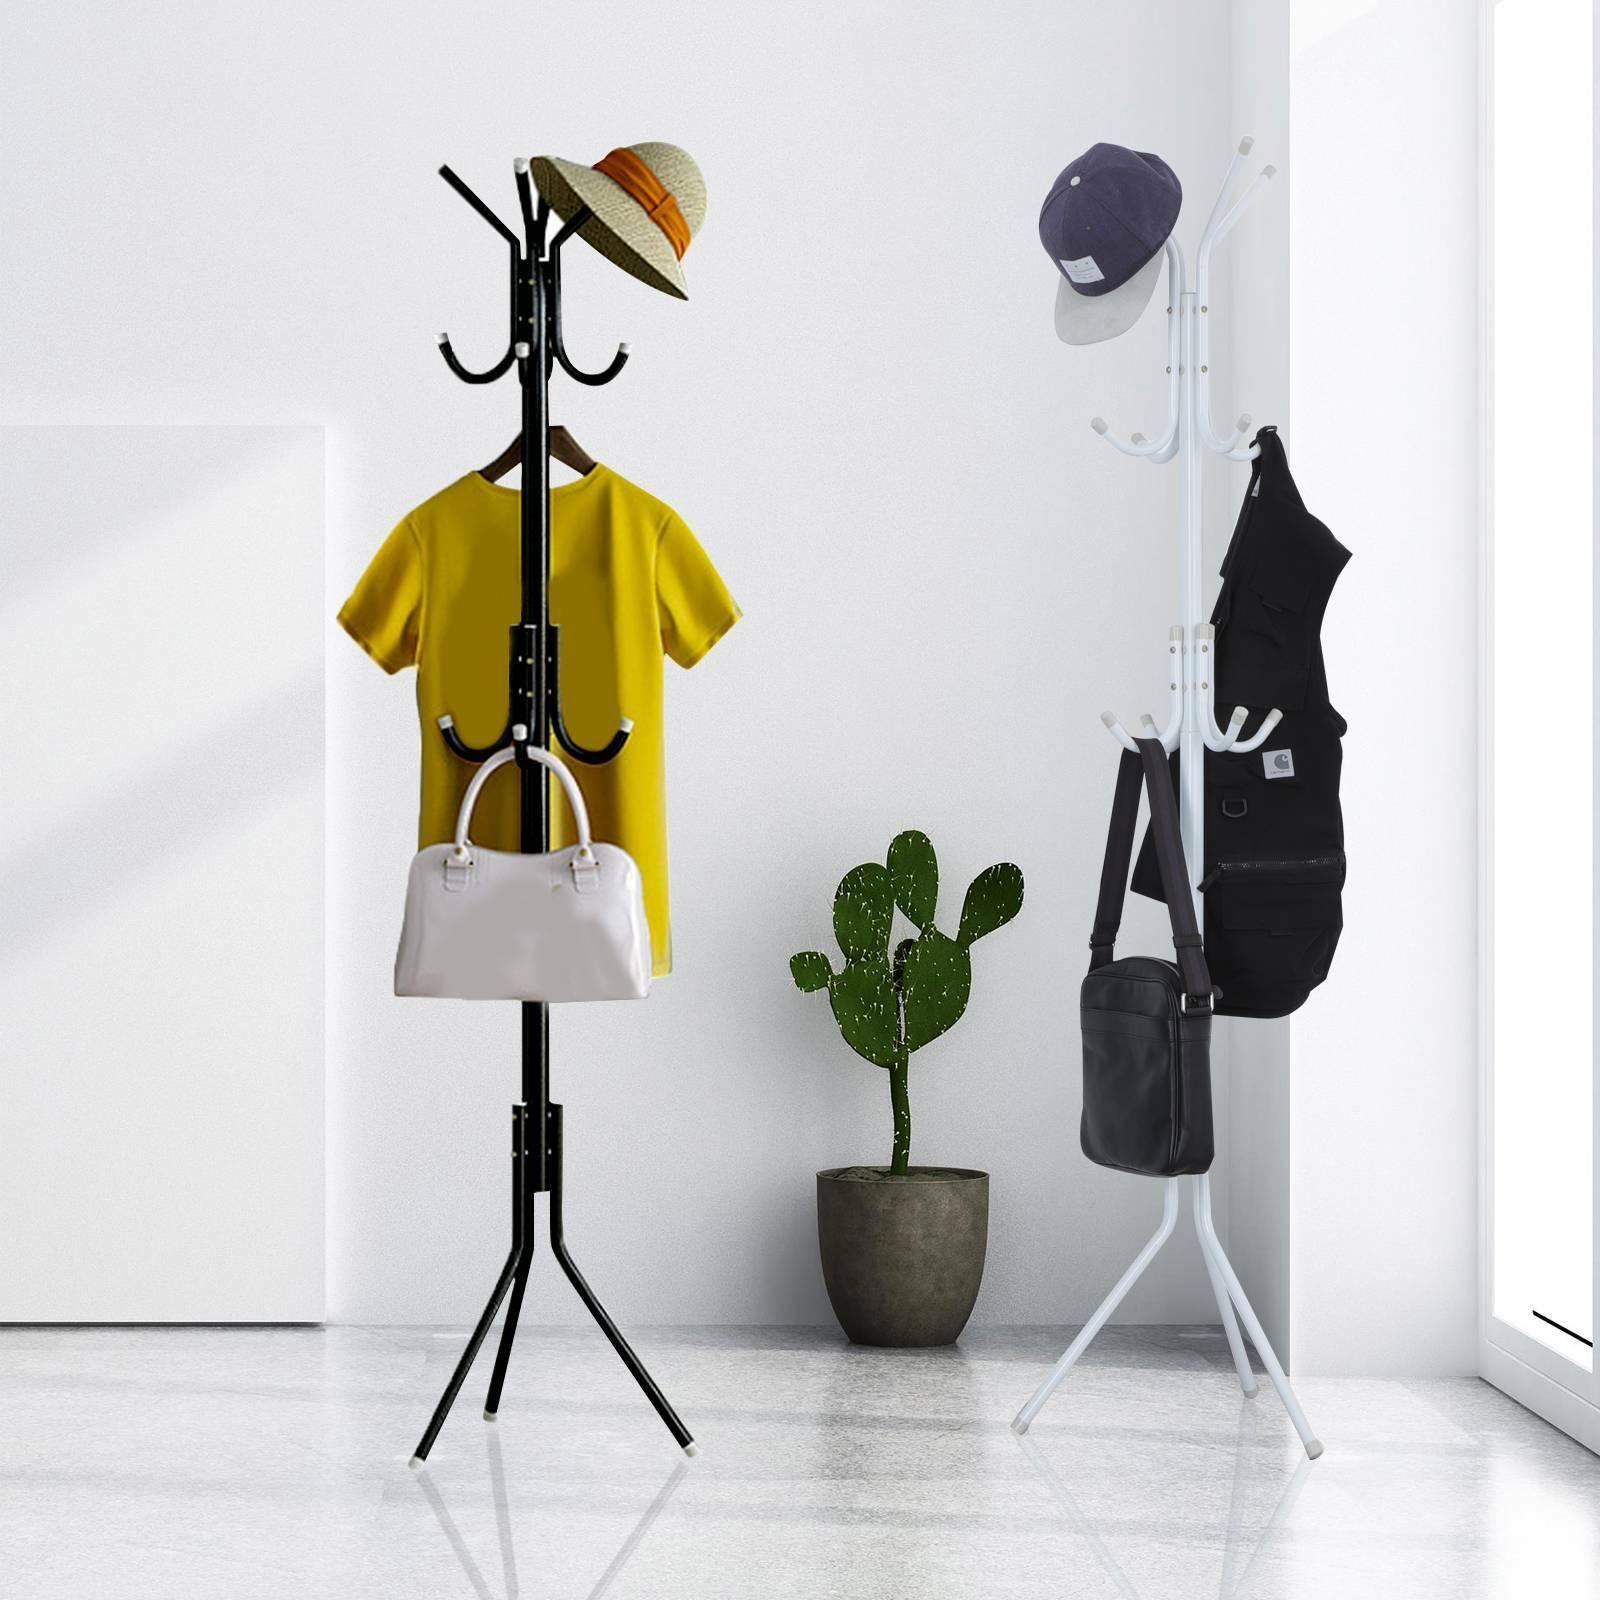 Coat Rack Hat Stand Tree Clothes Hanger Umbrella Holder Solid Organizer 8 Hooks